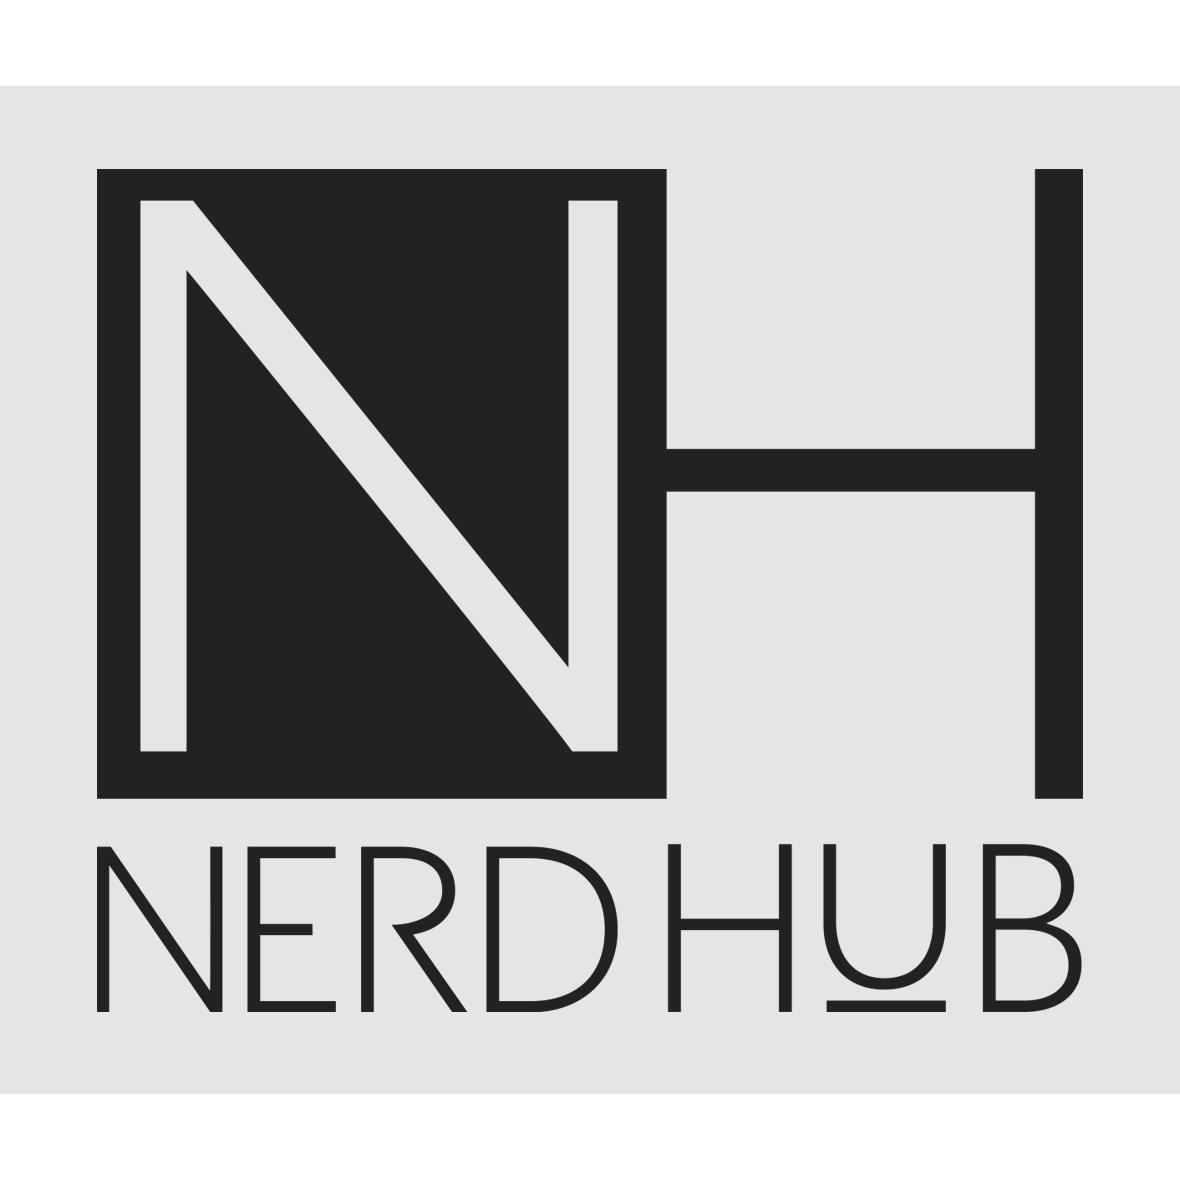 NerdHub Studio